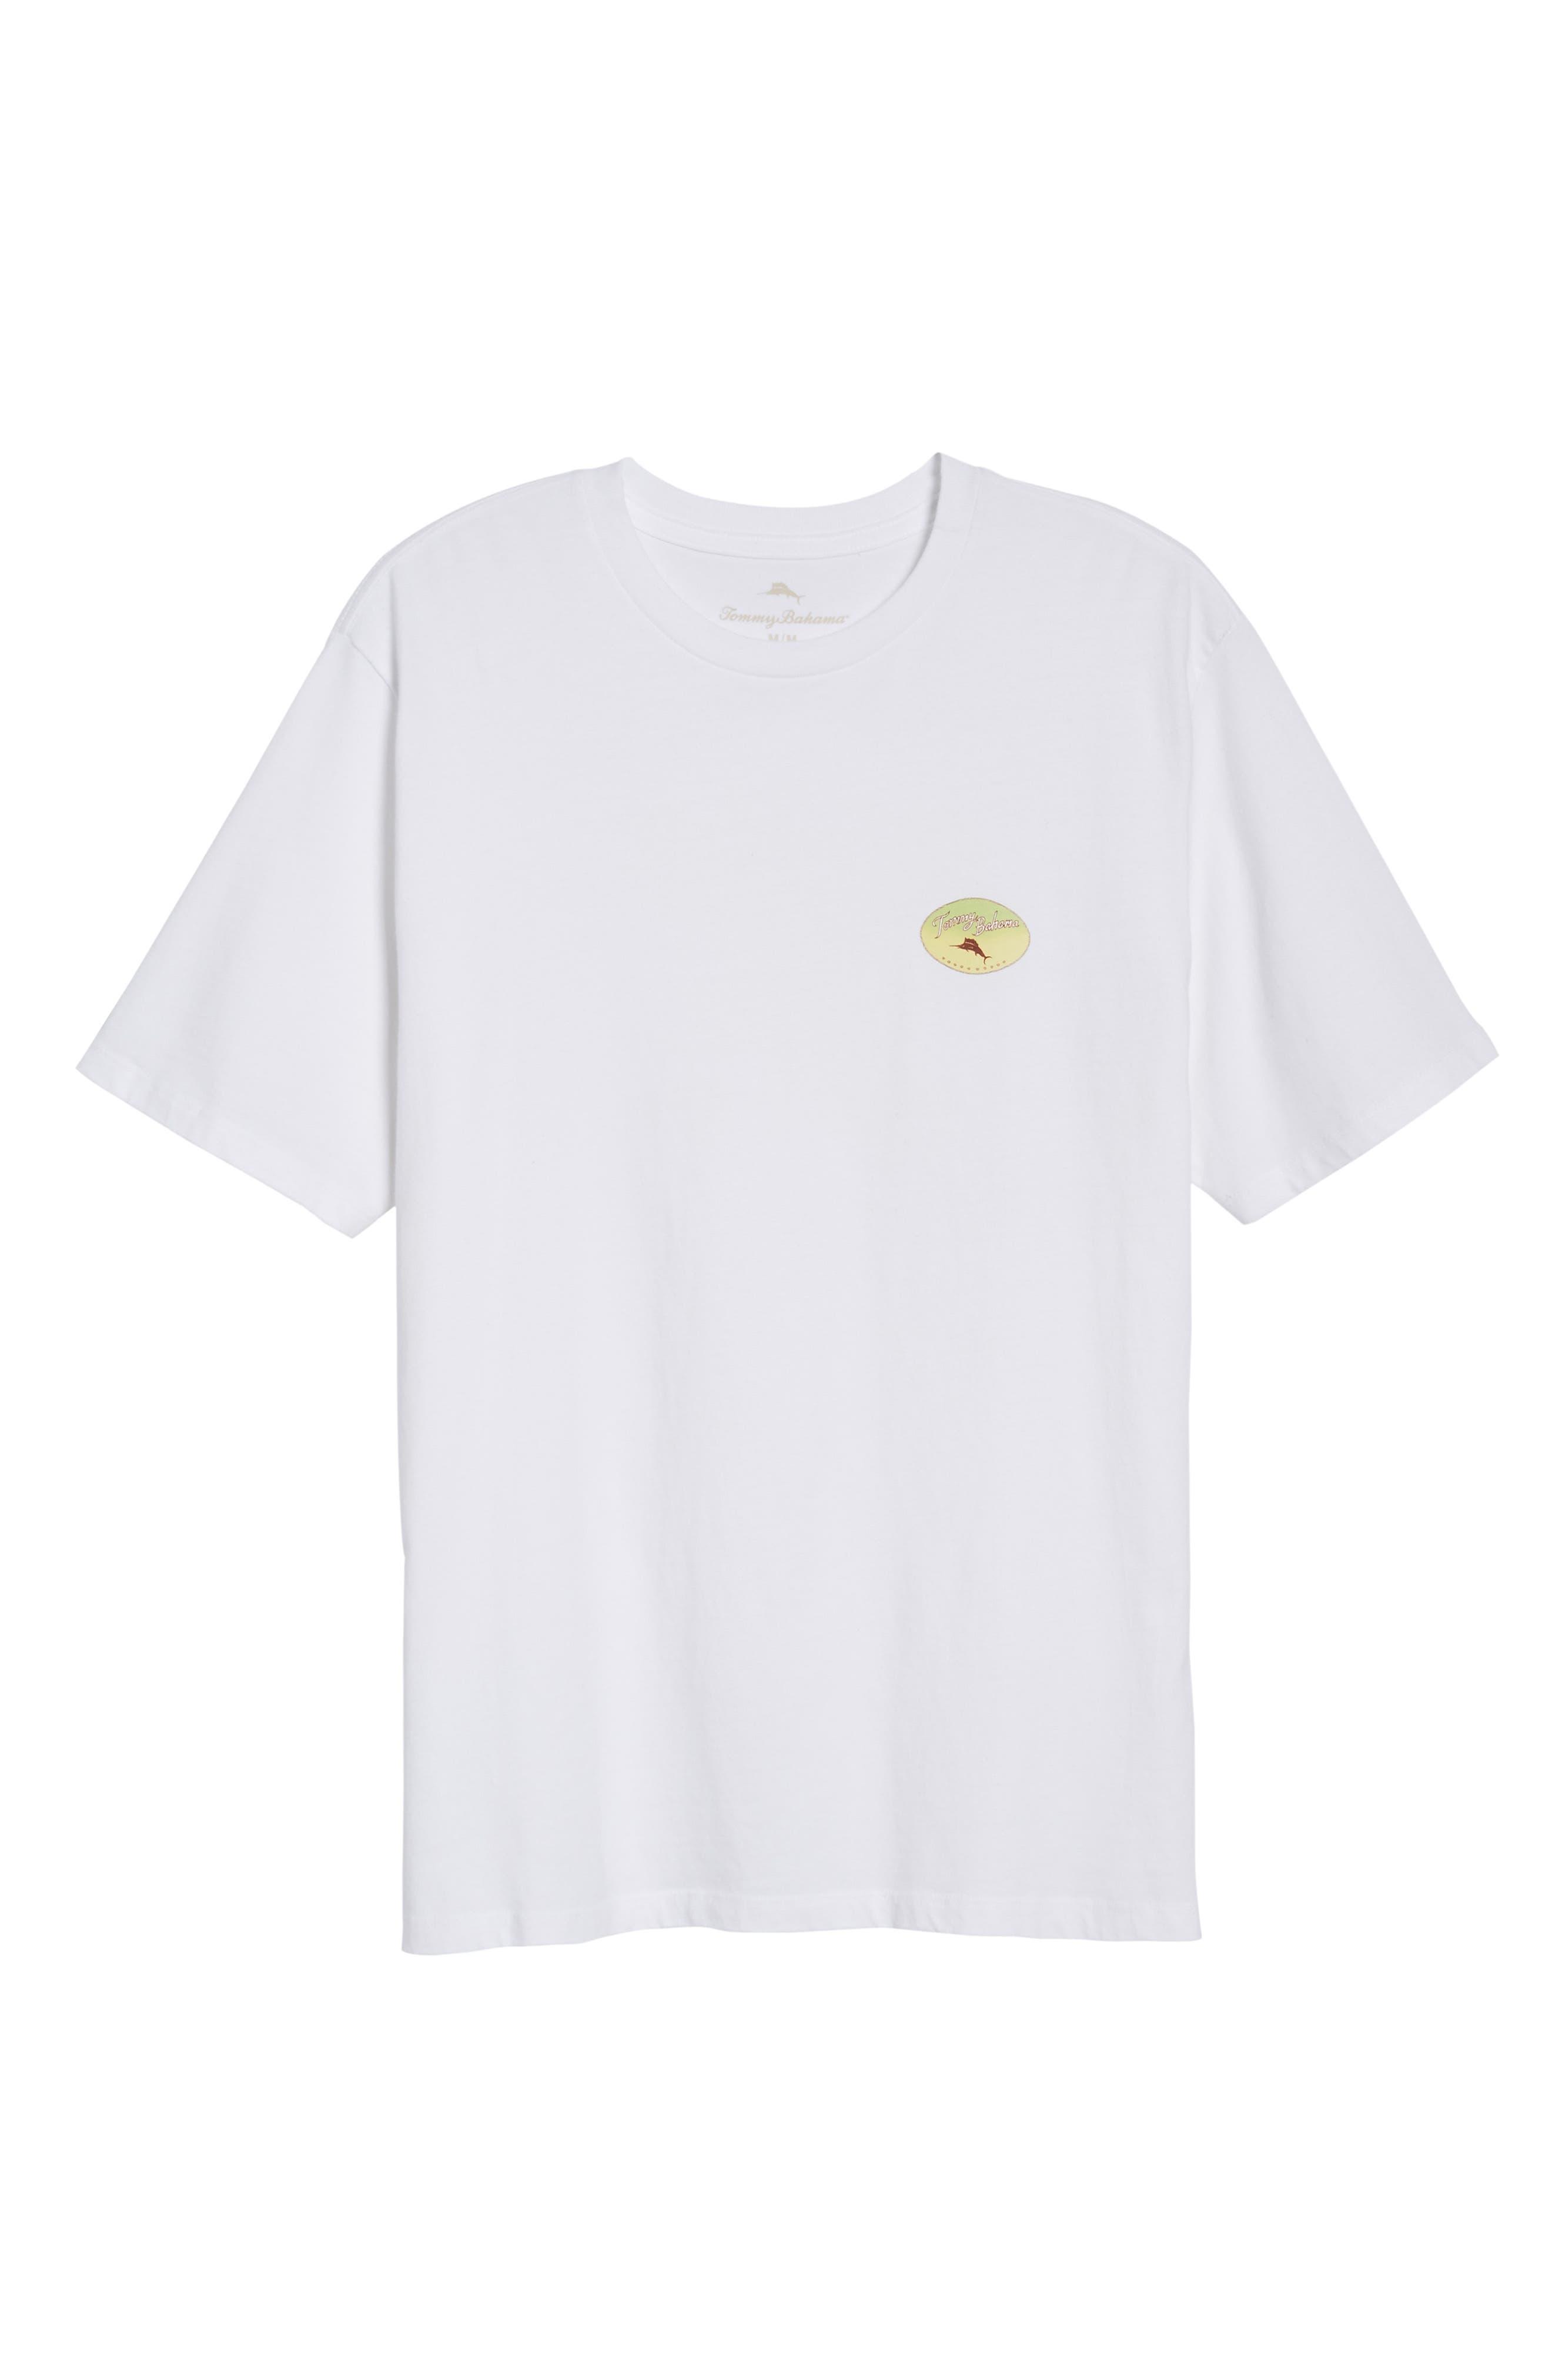 Improve Your Swing T-Shirt,                             Alternate thumbnail 6, color,                             100